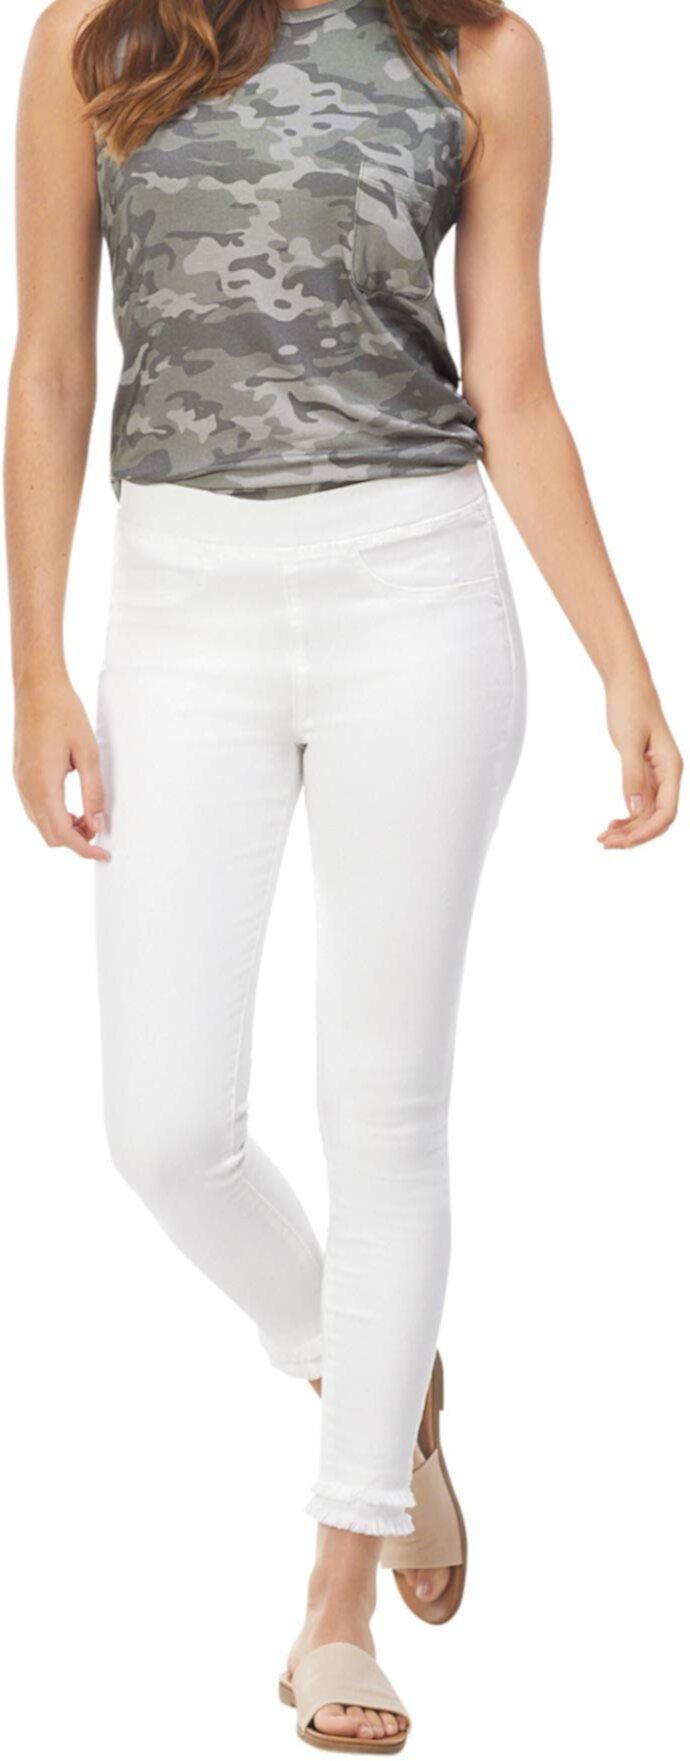 Mud Pie Women White Harlyn Fringe Jeans (Small) Mud Pie